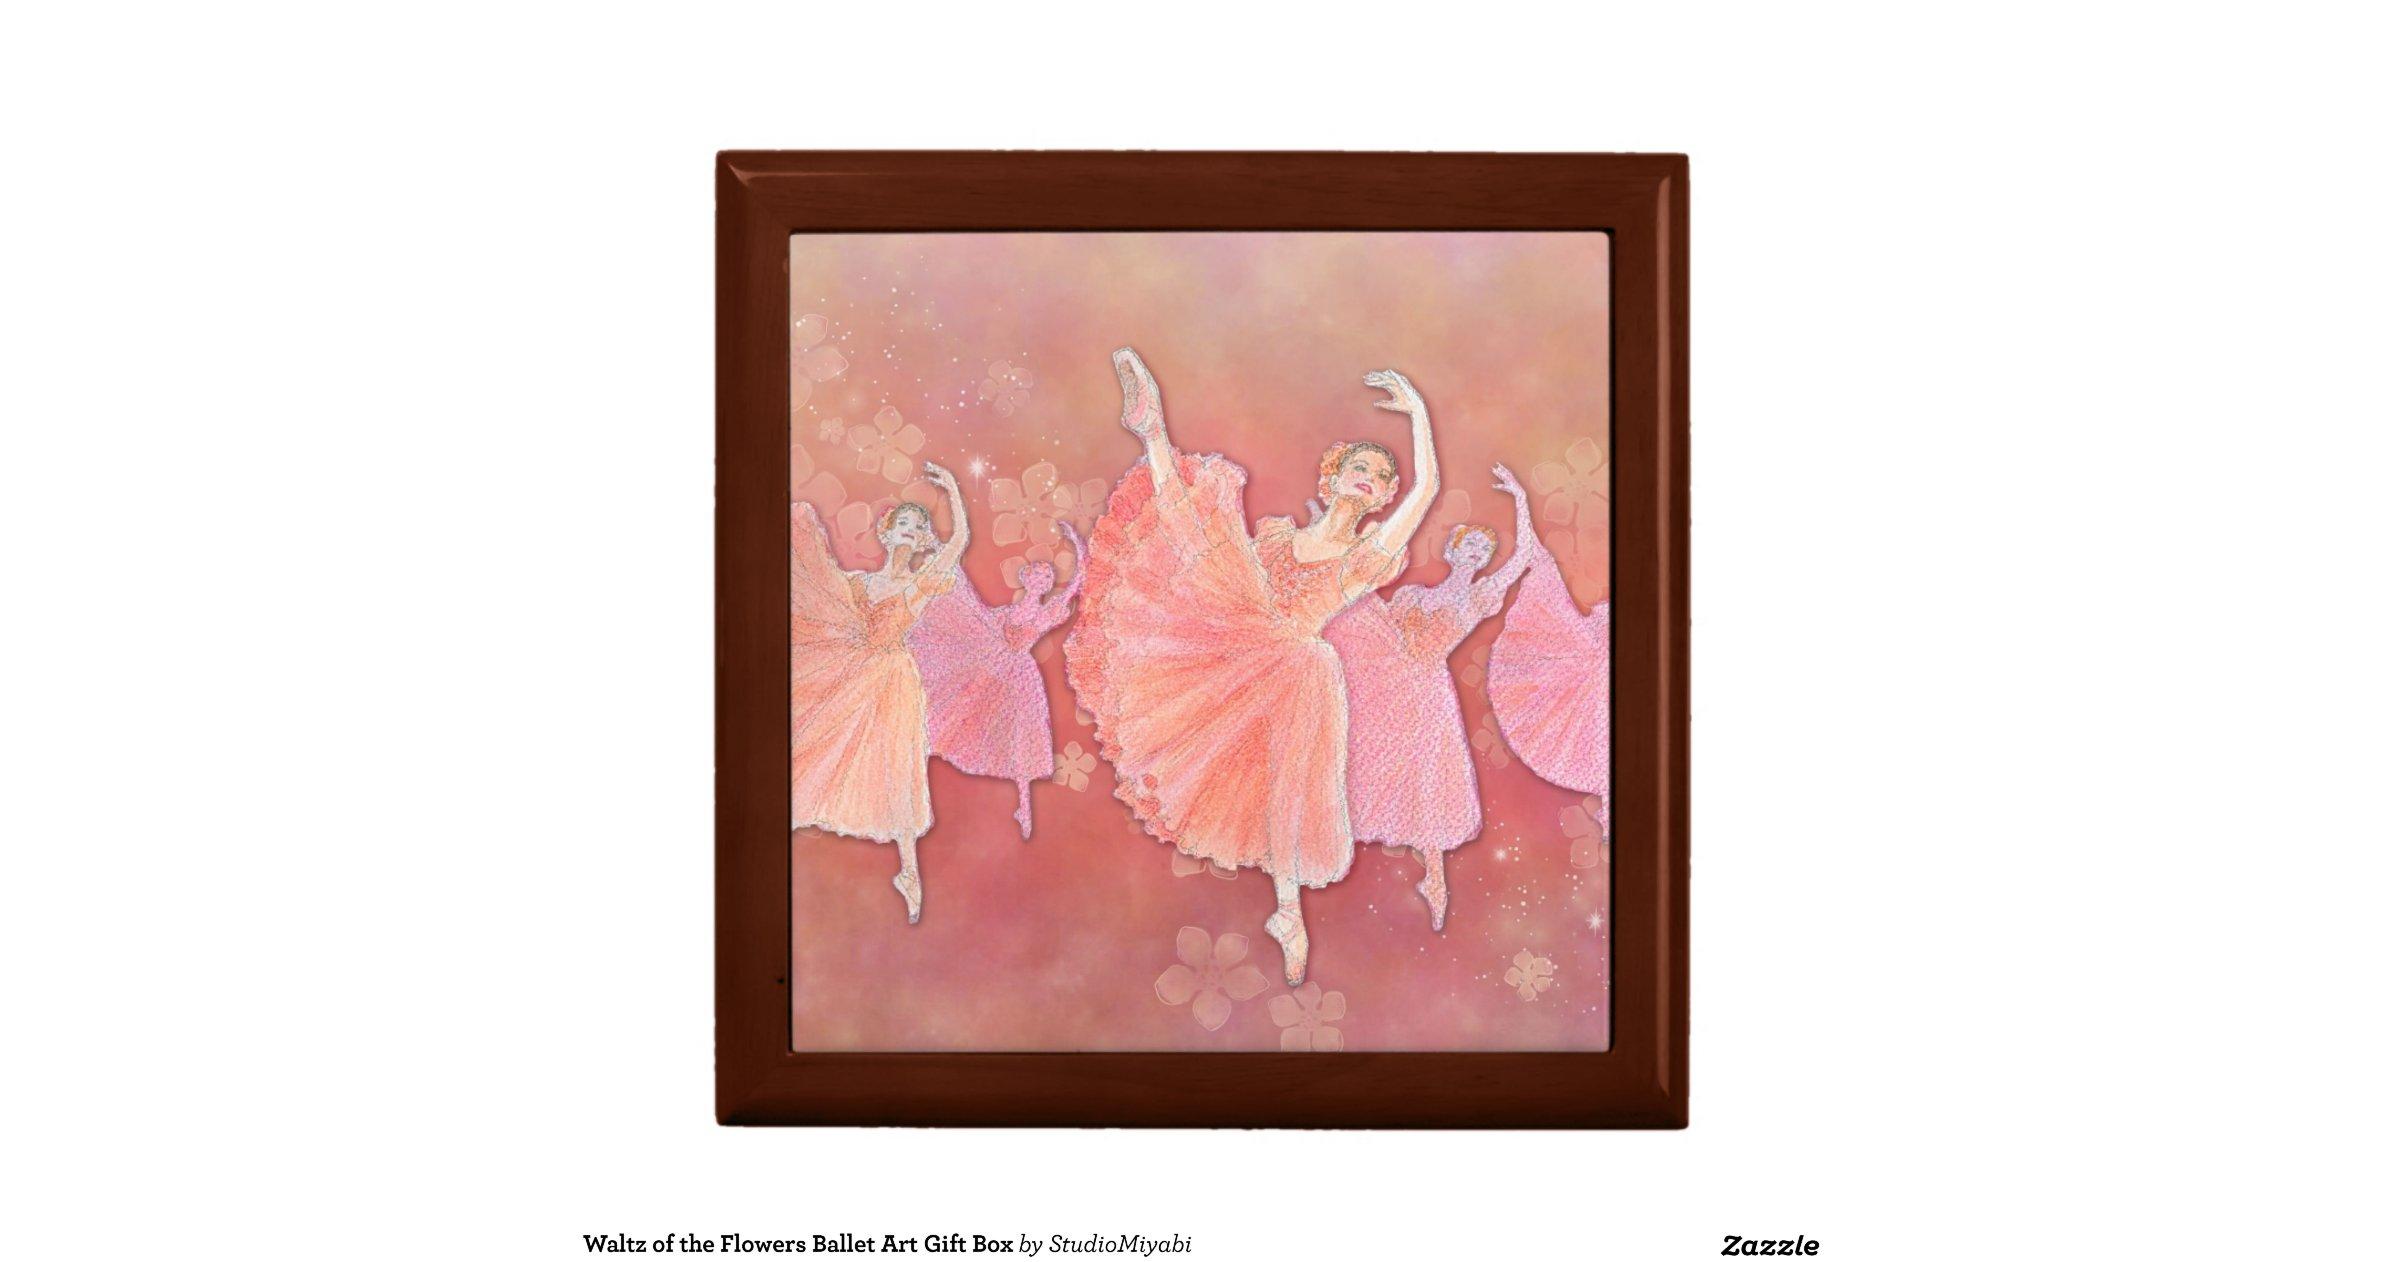 Waltz of the Flowers Ballet Art Gift Box